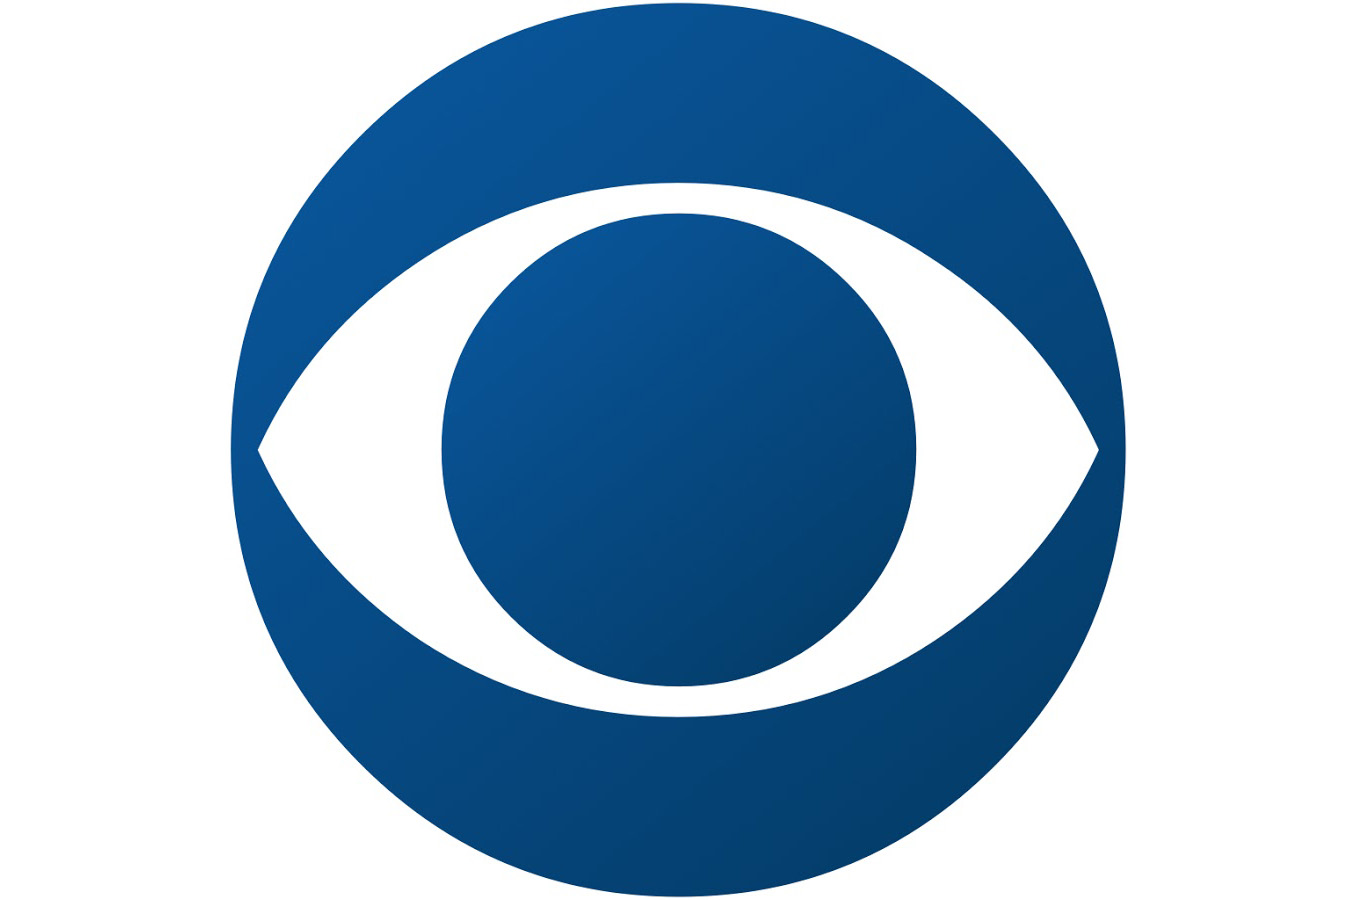 9 CBS All Access Problems & Fixes